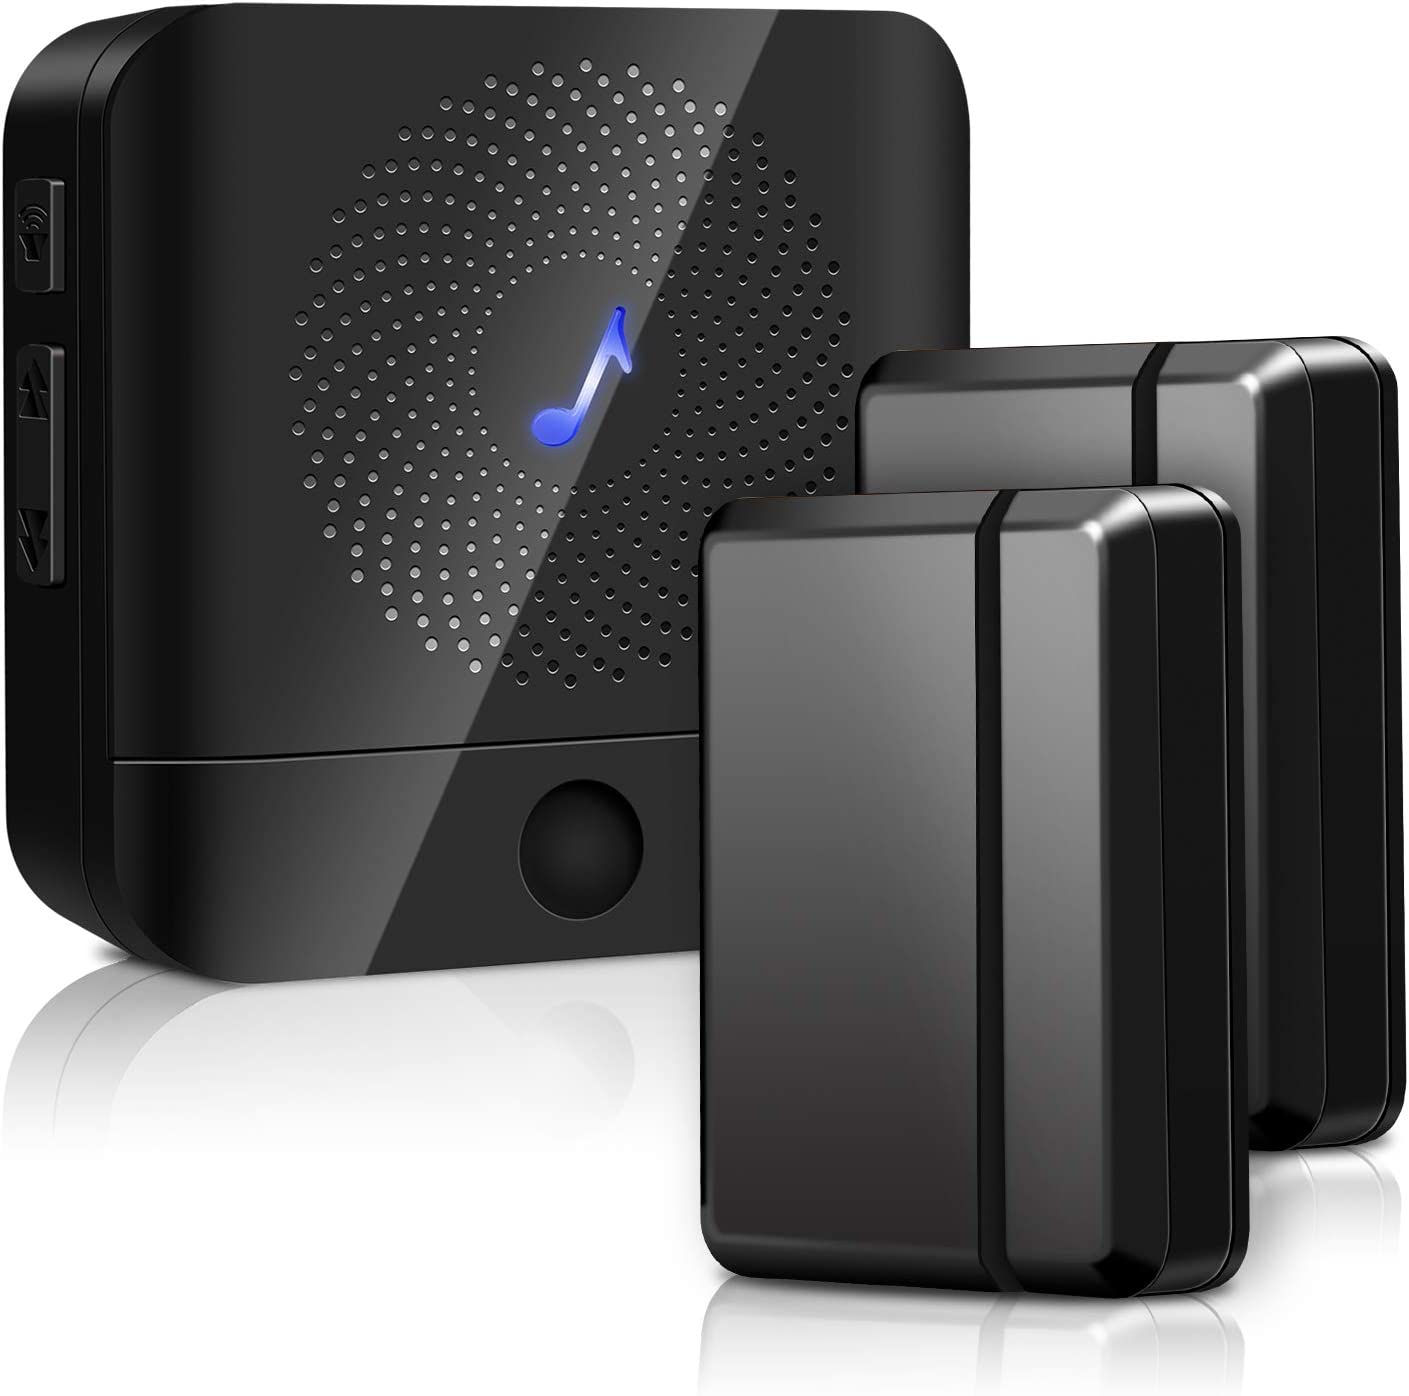 Door Chime Wireless Door Sensor - BISTEE Alarm Contact Door Open Chime Kit with 600 FT Range, 5 Volume Levels, 58 Melodies, LED Indicator for Business/Home/Office/Stores